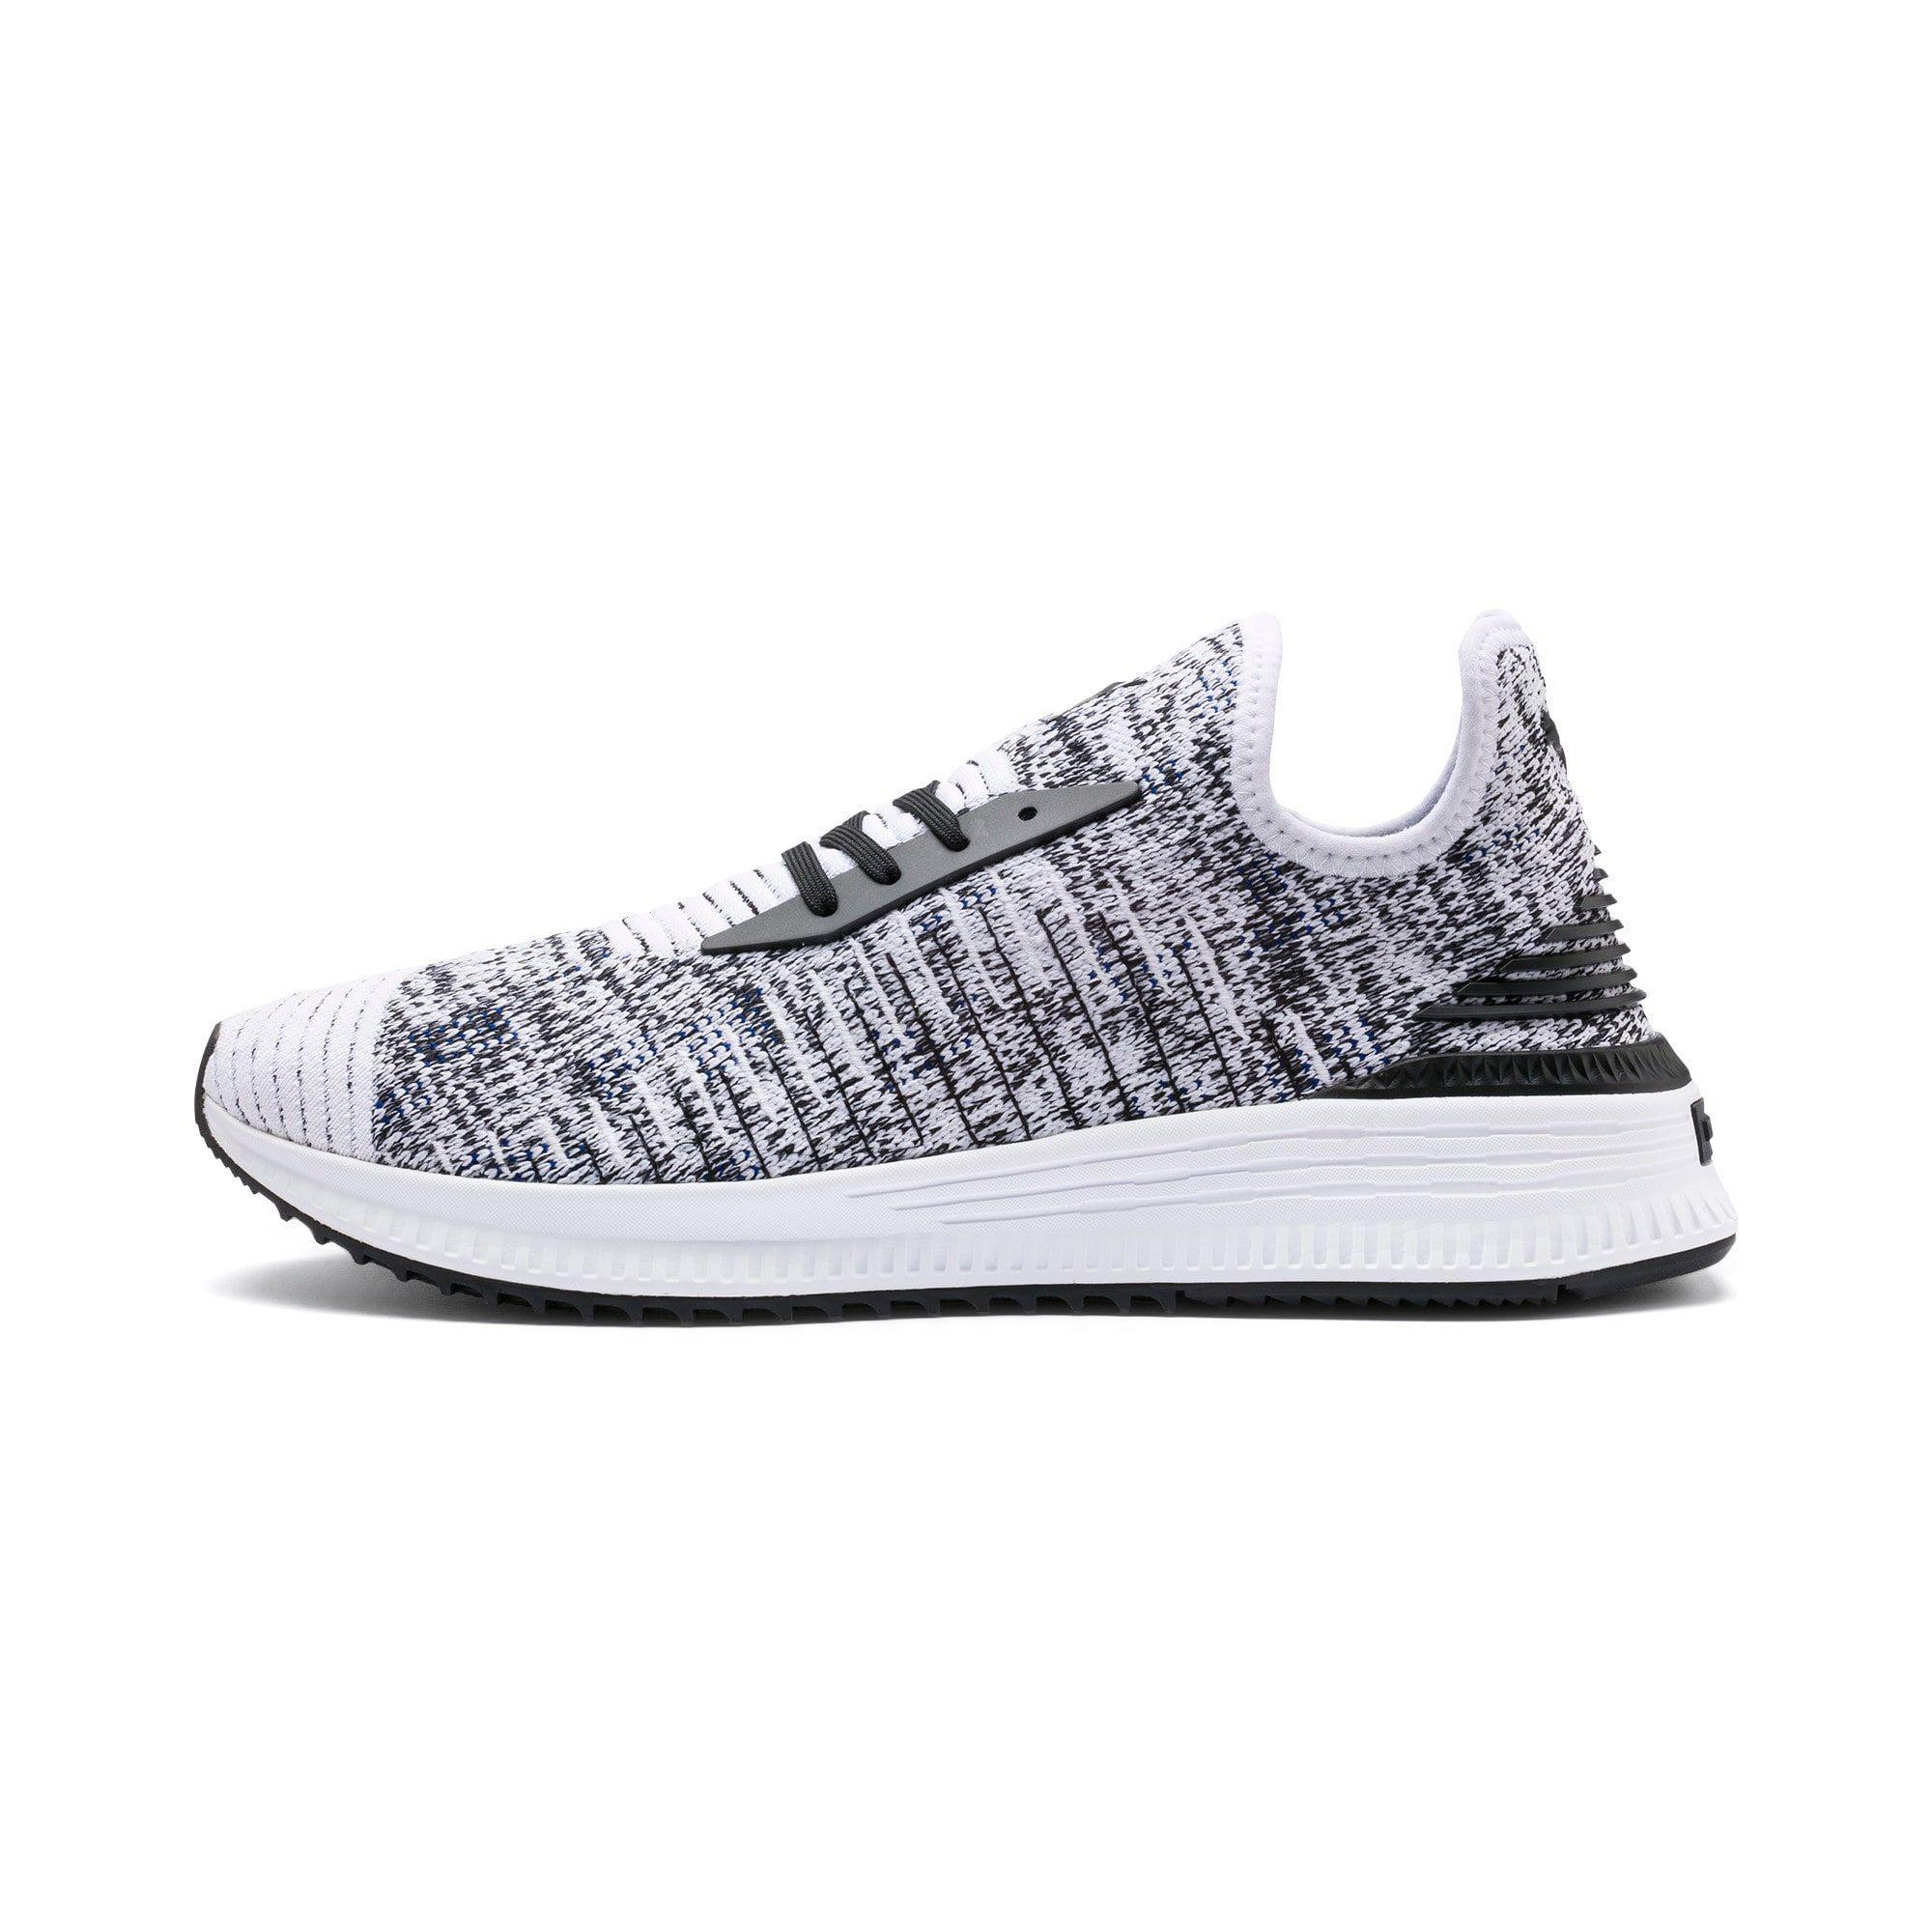 PUMA Avid EvoKnit Mosaic Evolution Trainers in White/Black/Sodalite Blue size 3.5 #whiteembroidery